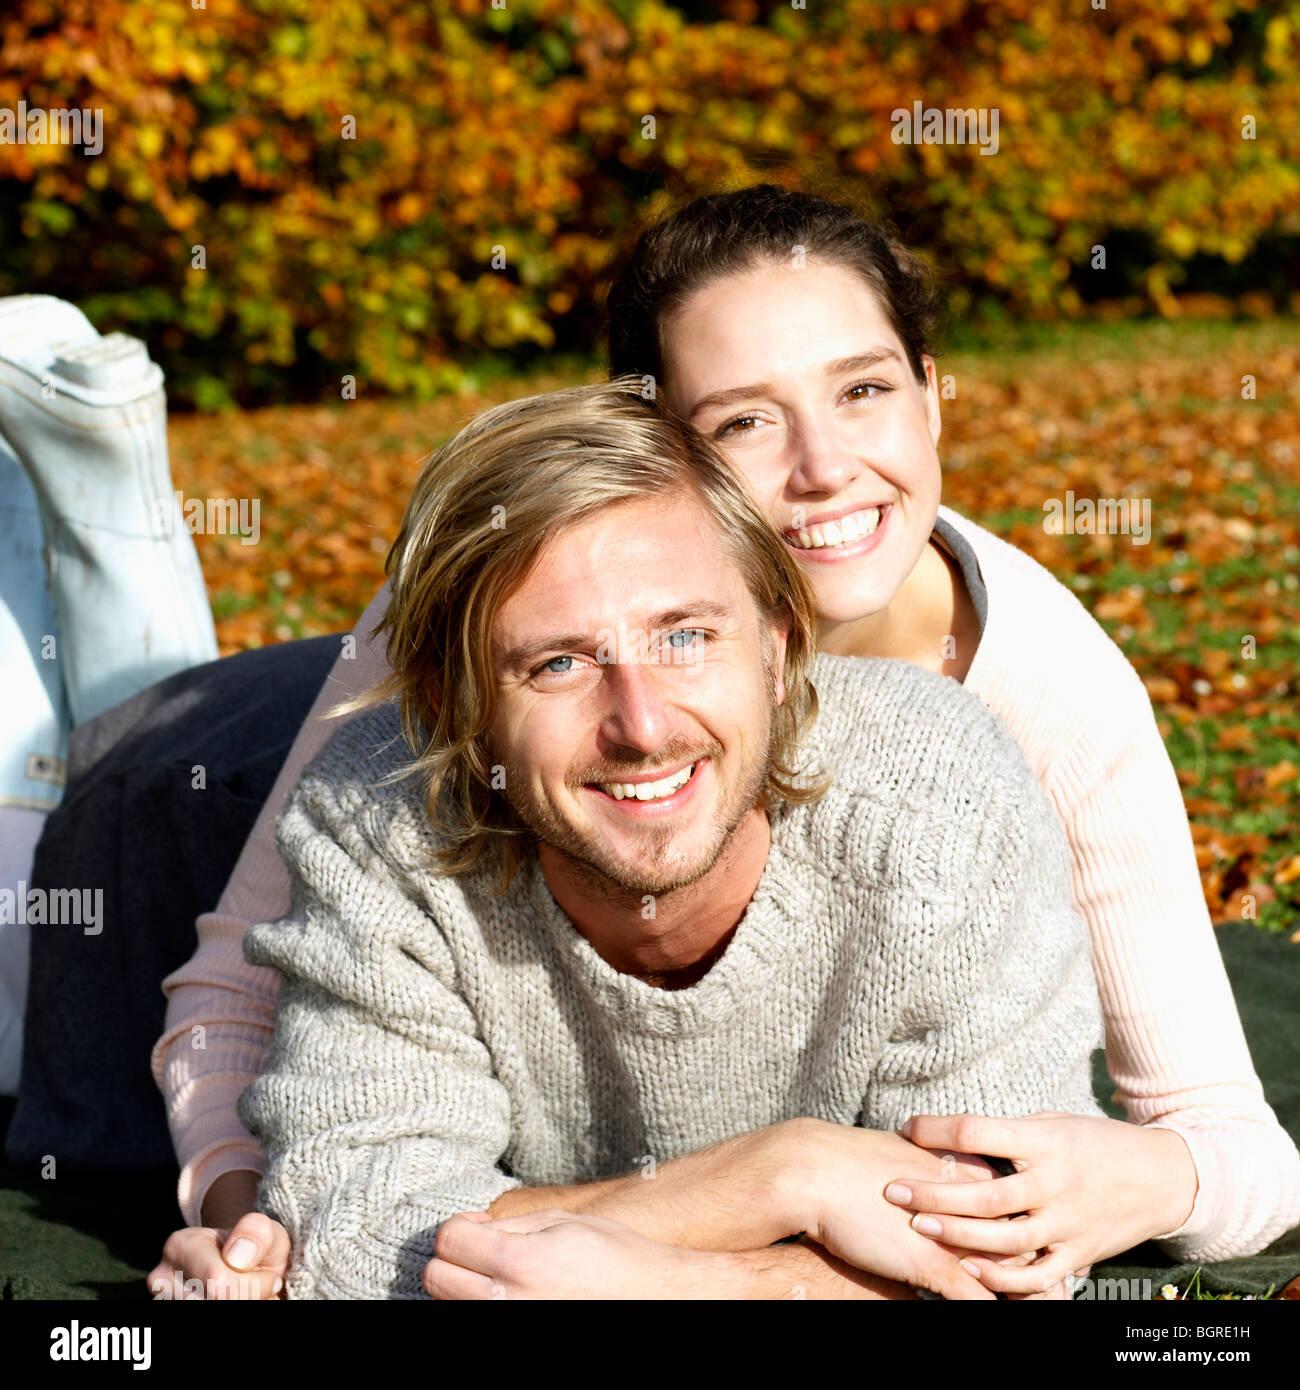 Free dating site in sweden escort i skne tranny sverige tby